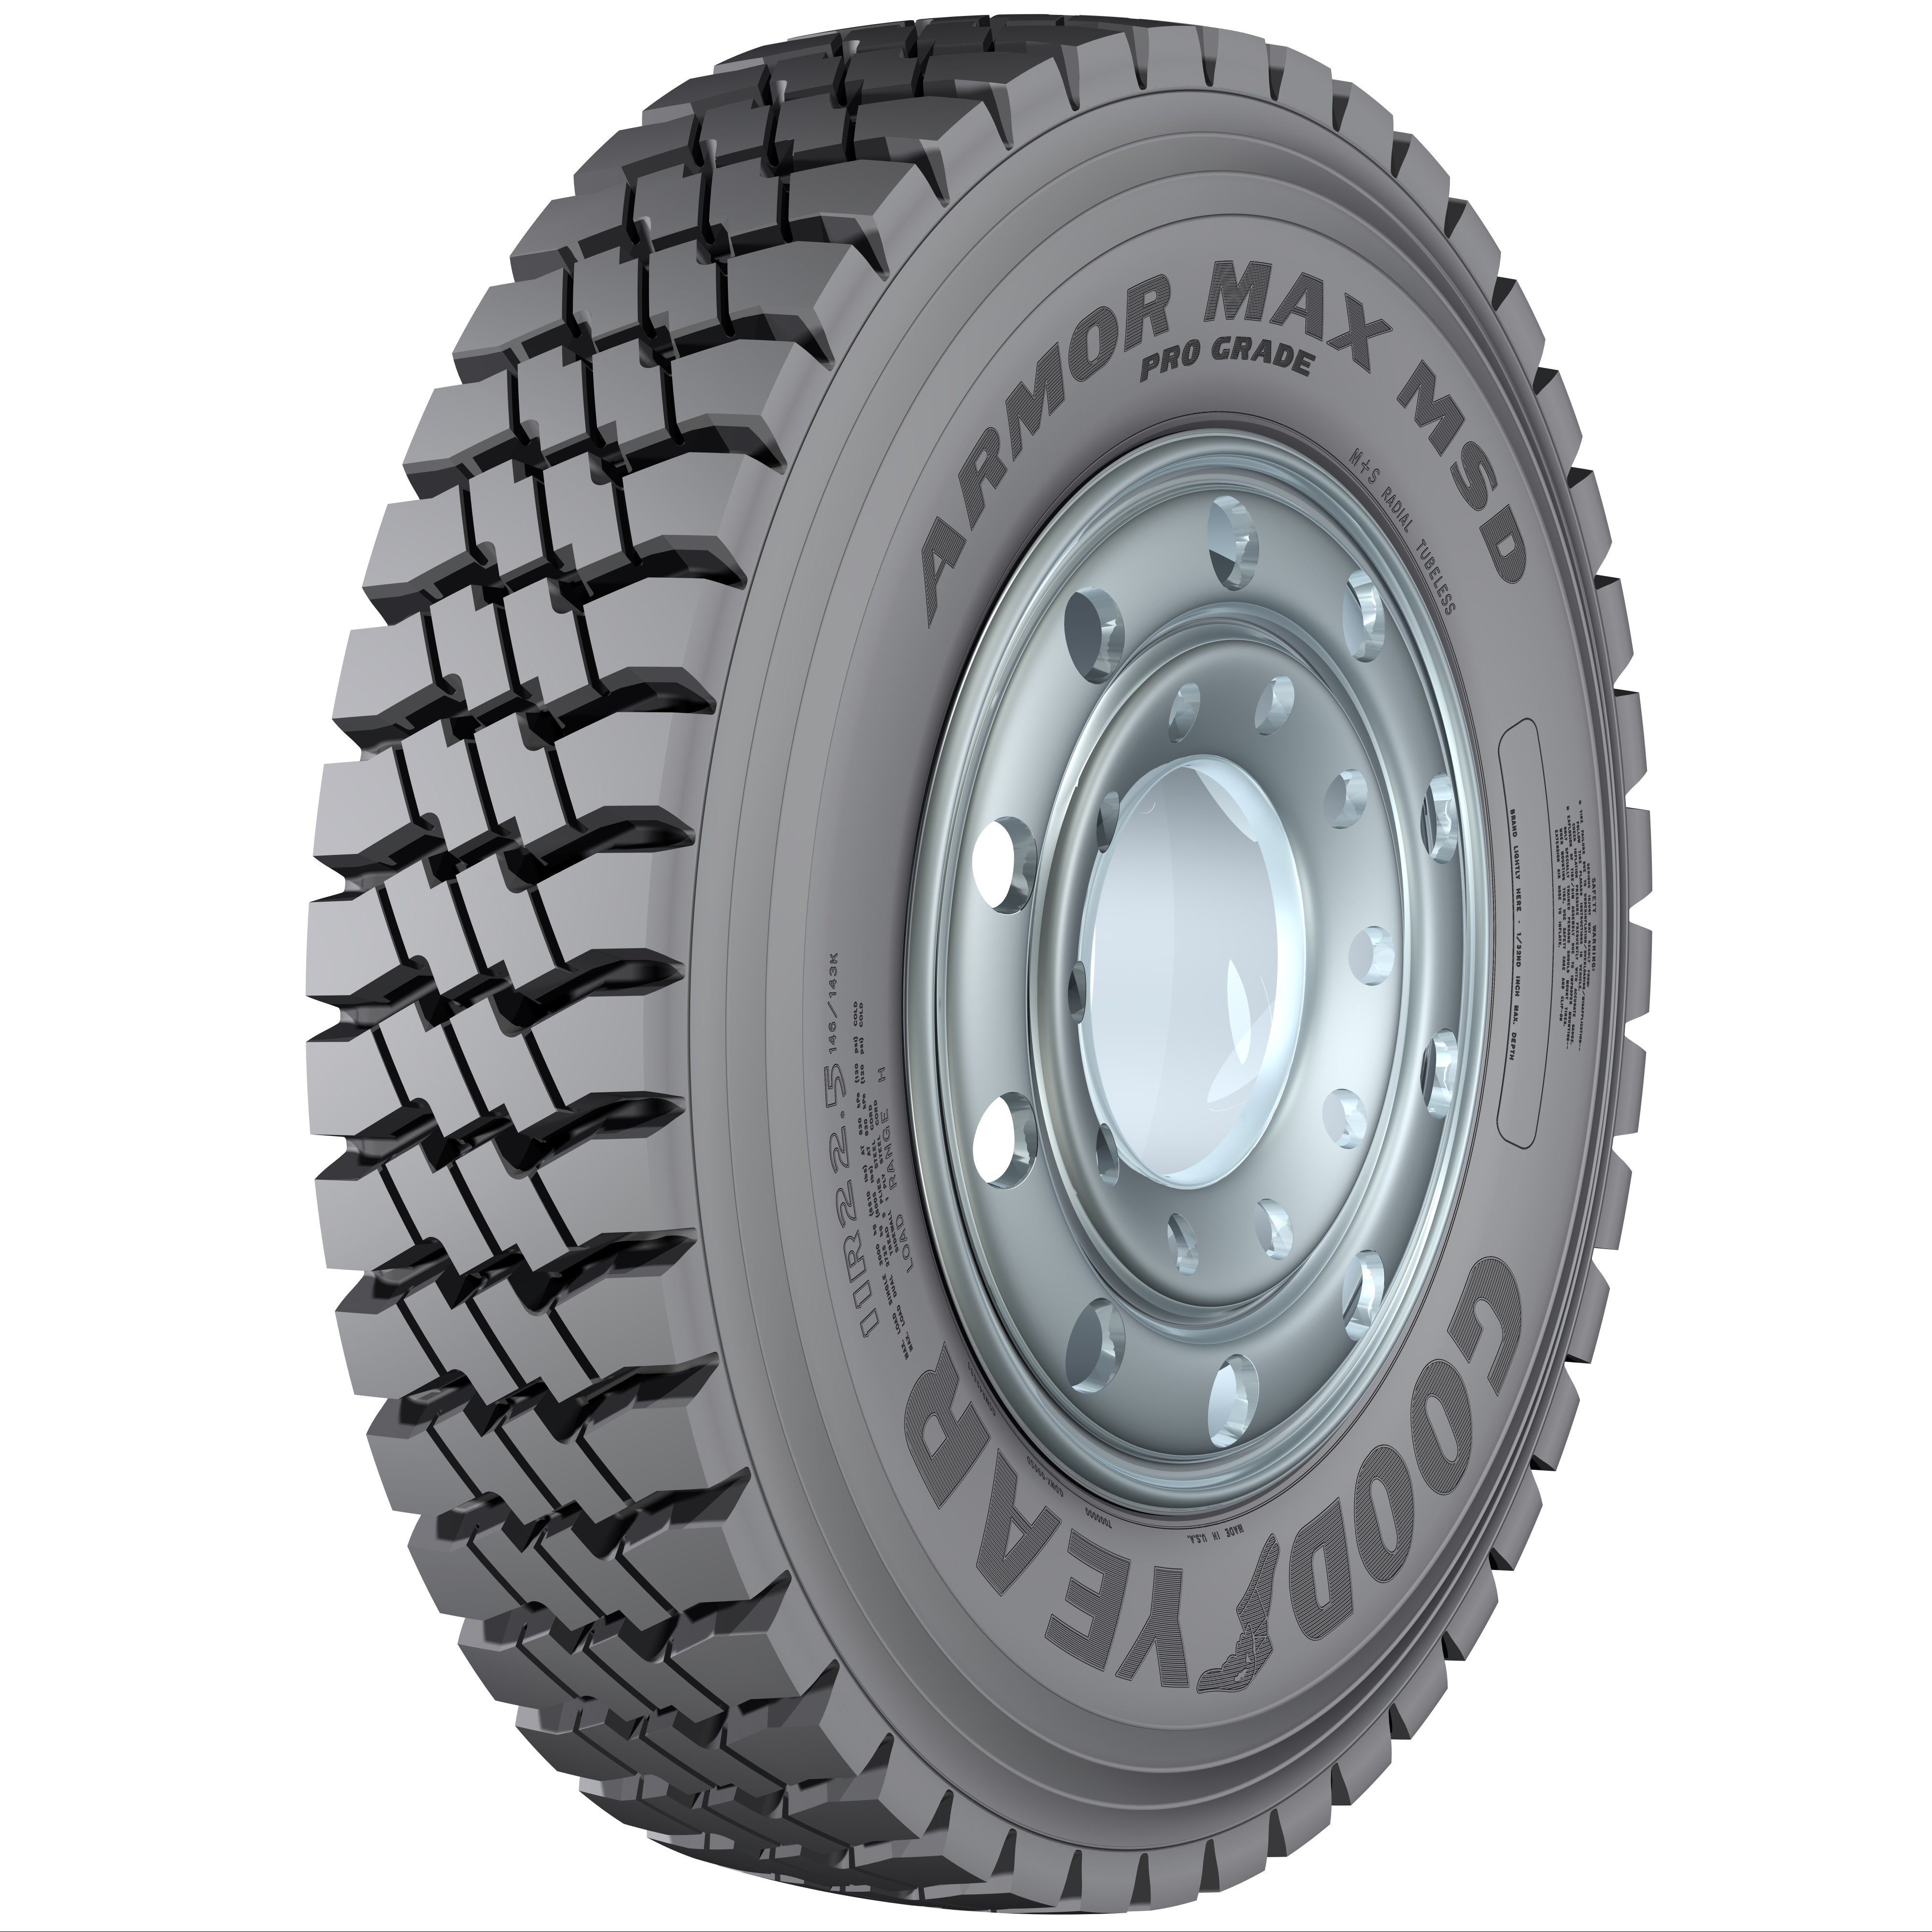 Goodyear Armor Max Pro Grade MSD Tire